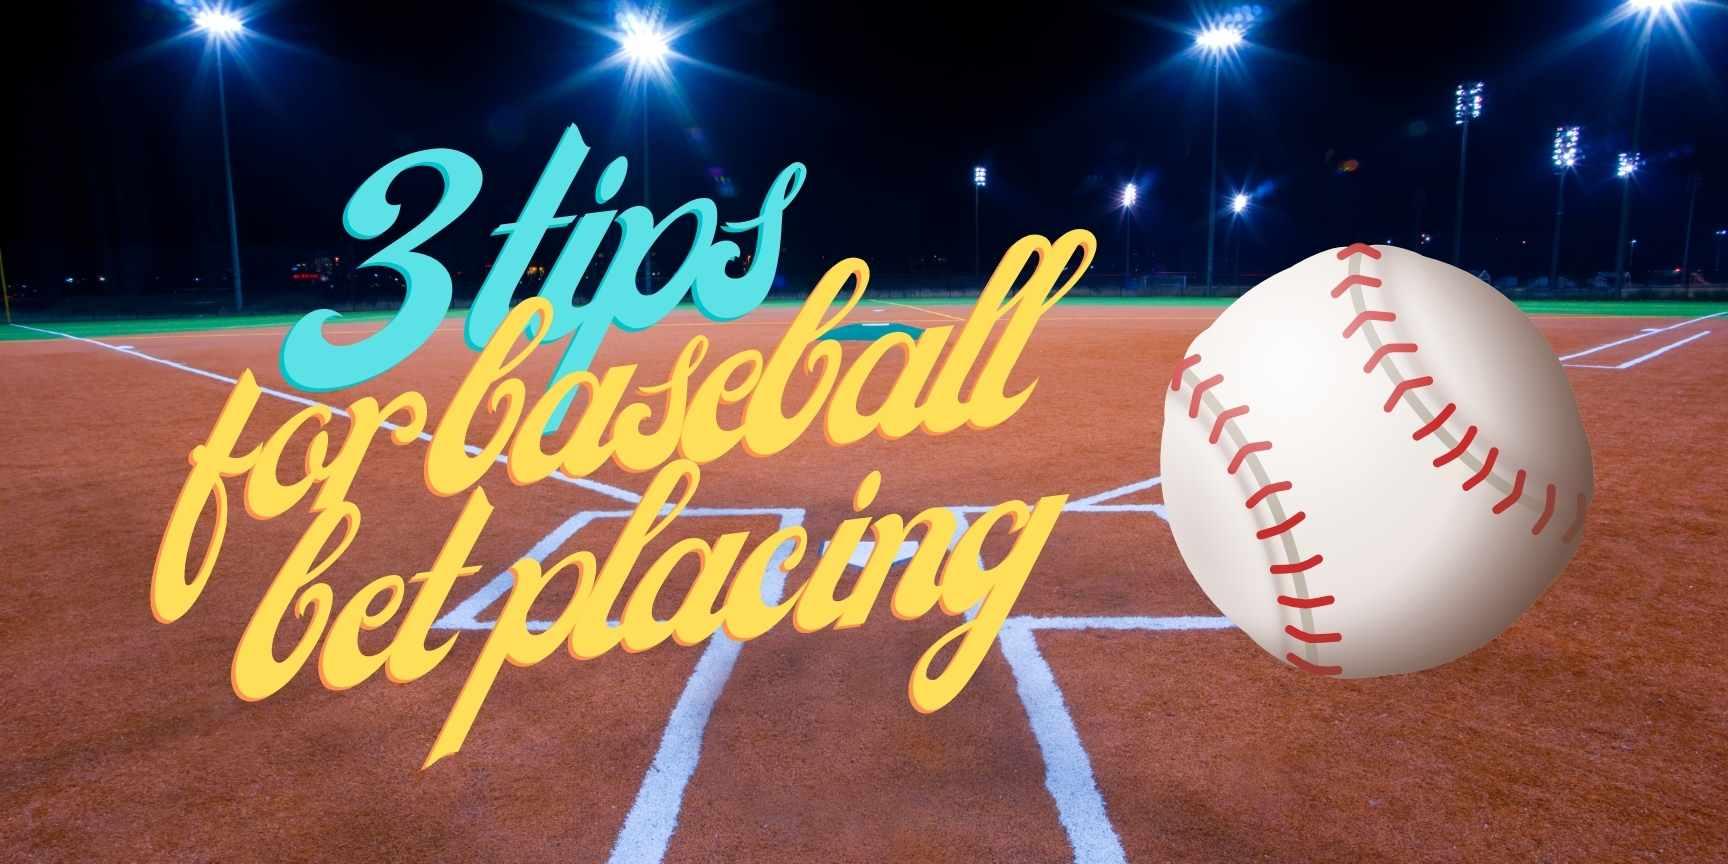 baseball bet placing